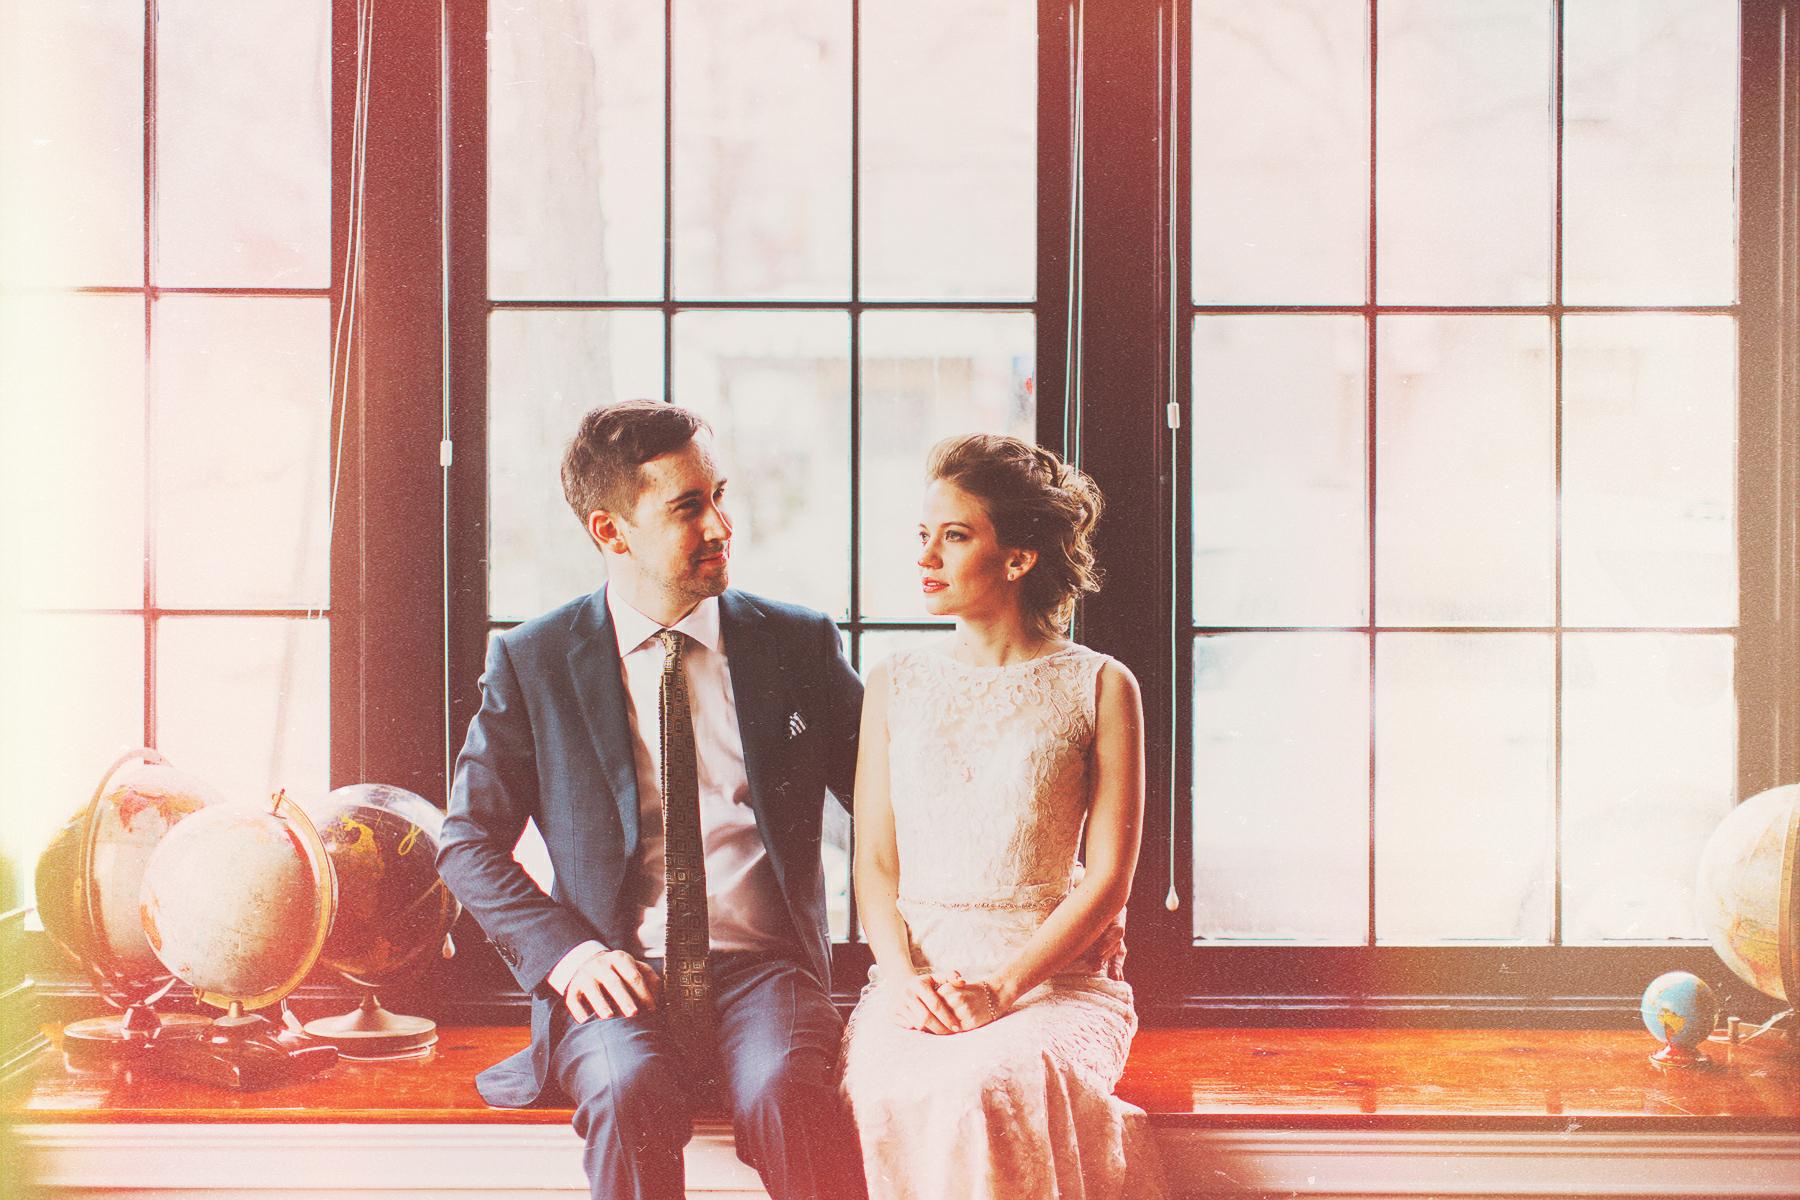 washington dc photography studio wedding photos